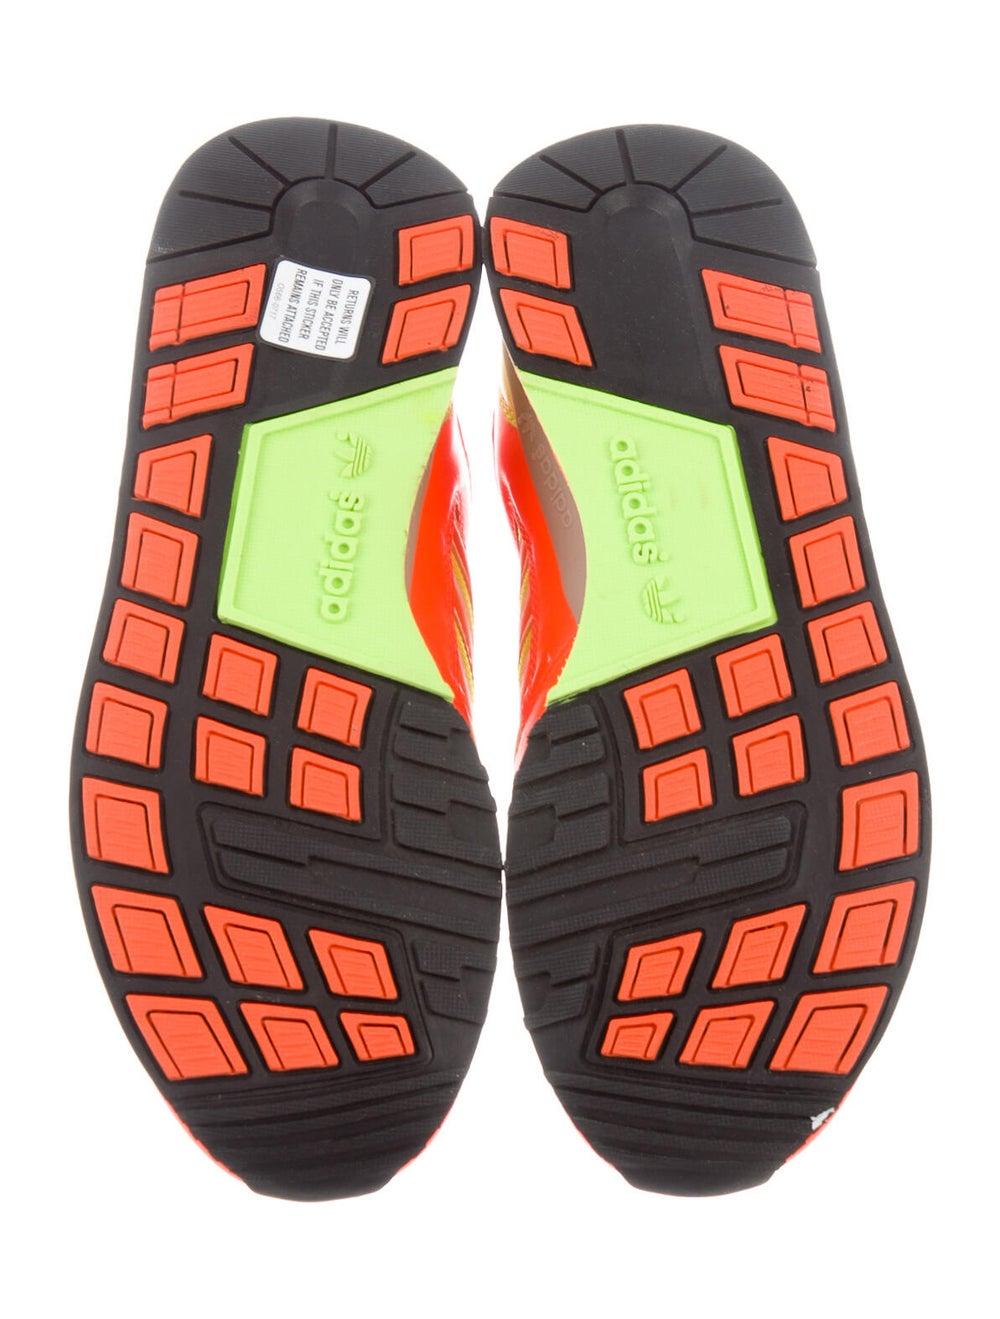 Adidas Leather Printed Athletic Sneakers Orange - image 5